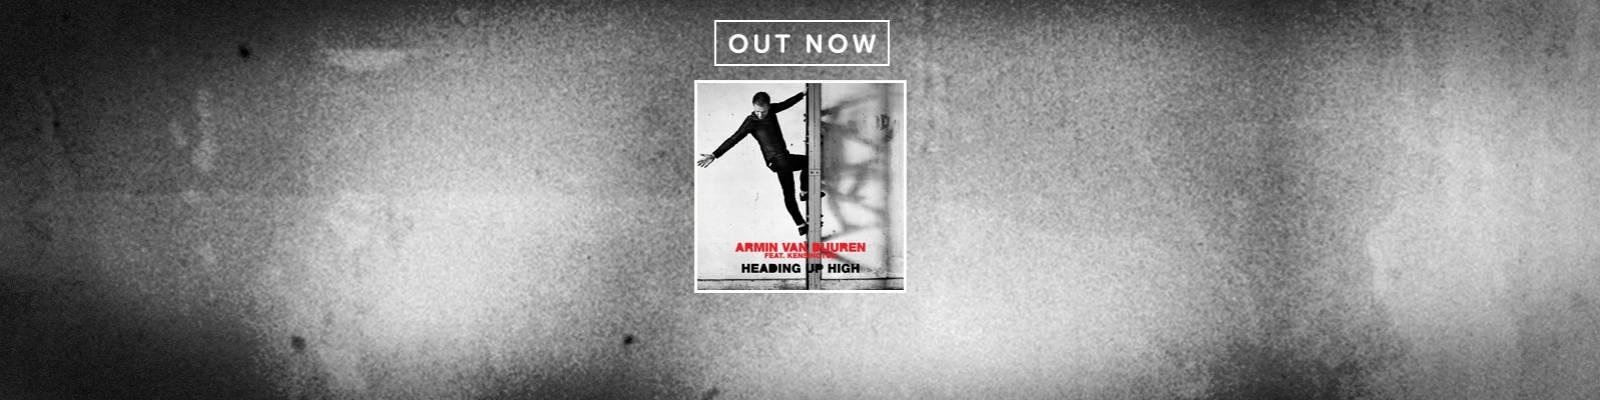 OUT NOW: Armin van Buuren feat. Kensington – Heading Up High